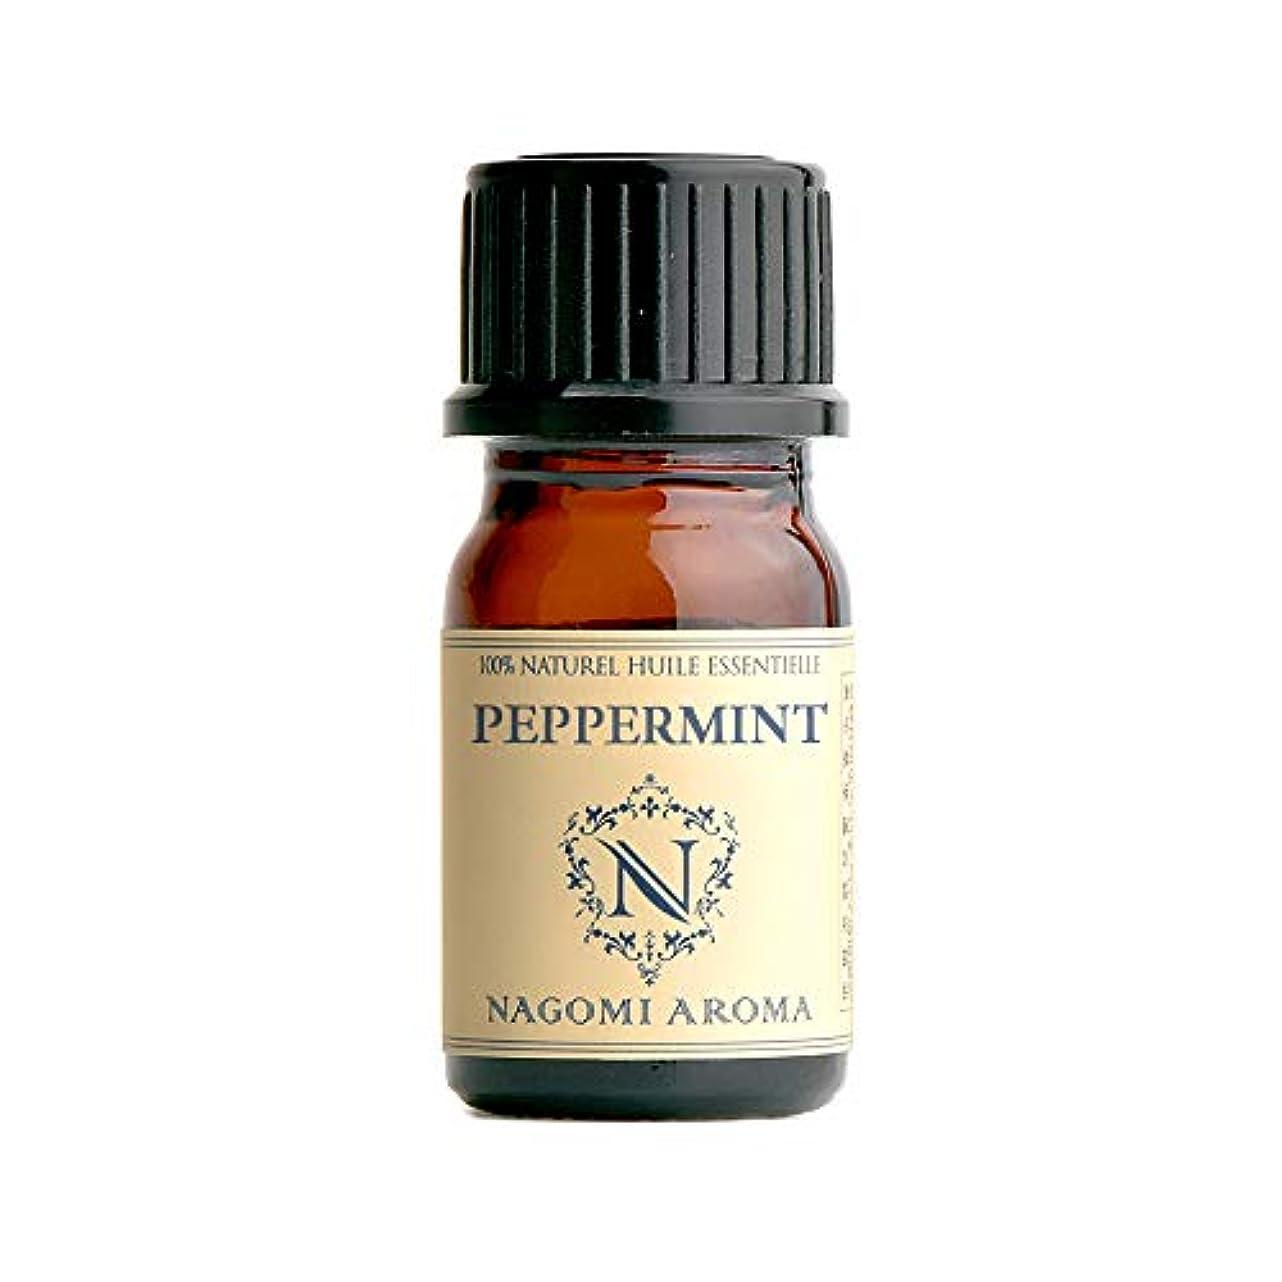 【AEAJ認定表示基準認定精油】NAGOMI PURE ペパーミント 5ml 【エッセンシャルオイル】【精油】【アロマオイル】